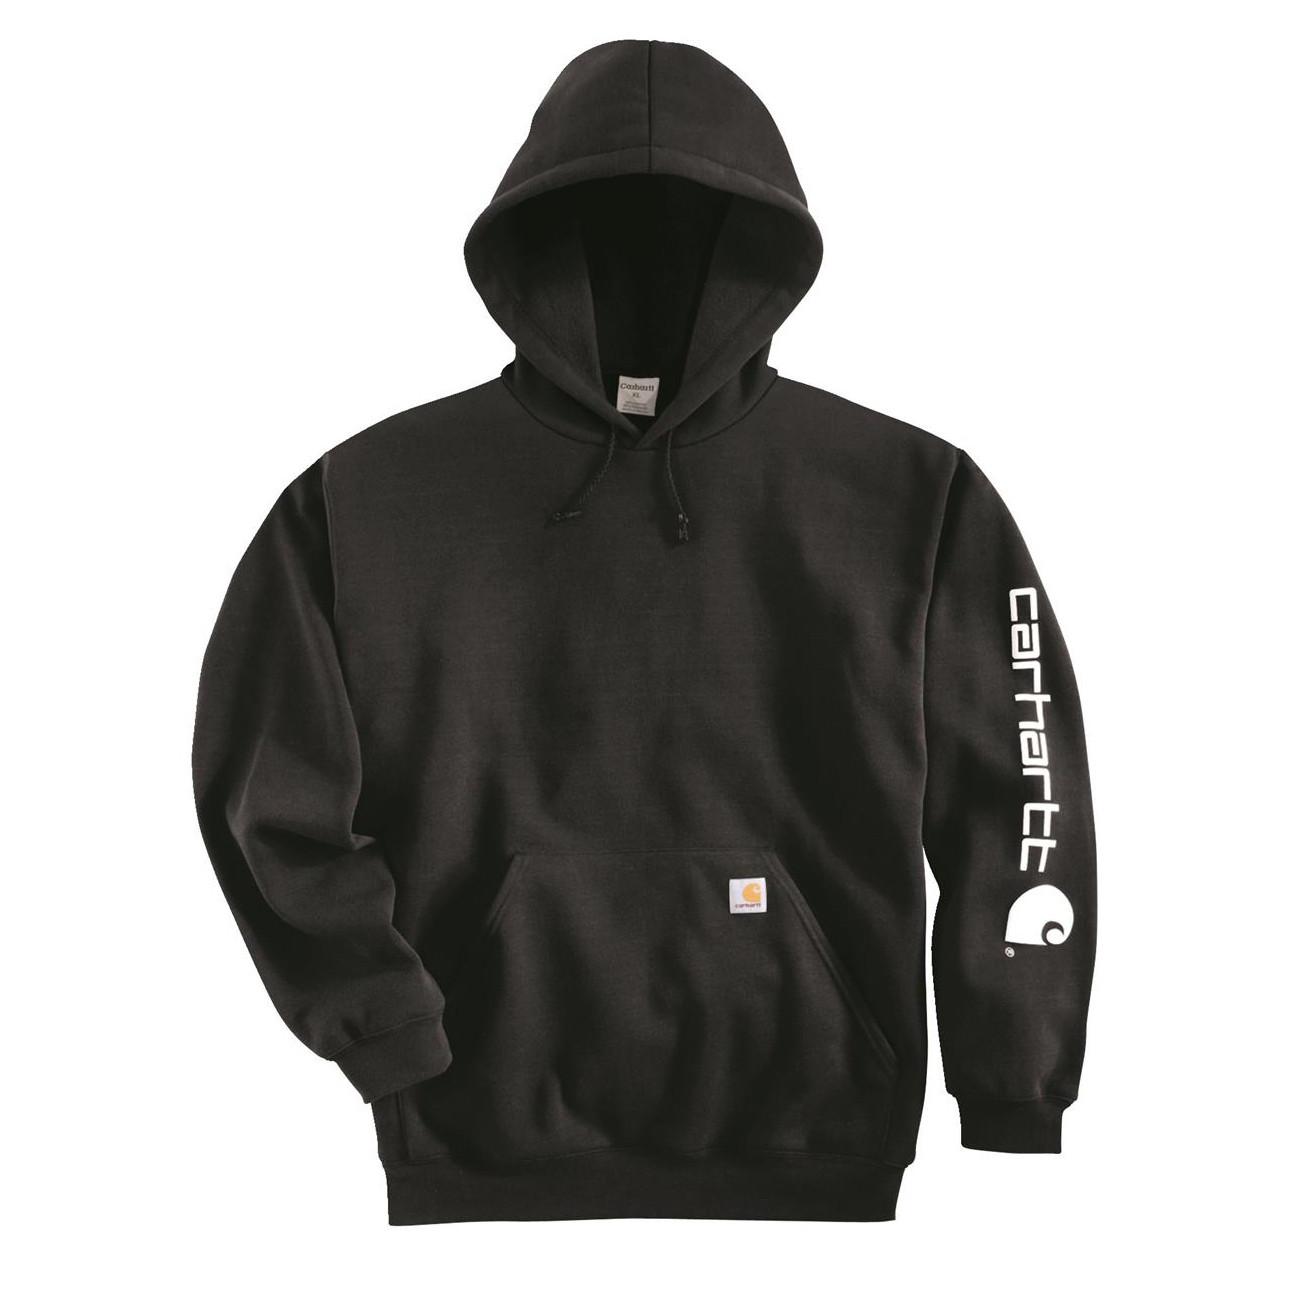 Худи Carhartt Sleeve Logo Hooded Sweatshirt - K288 (Dark Brown, S)